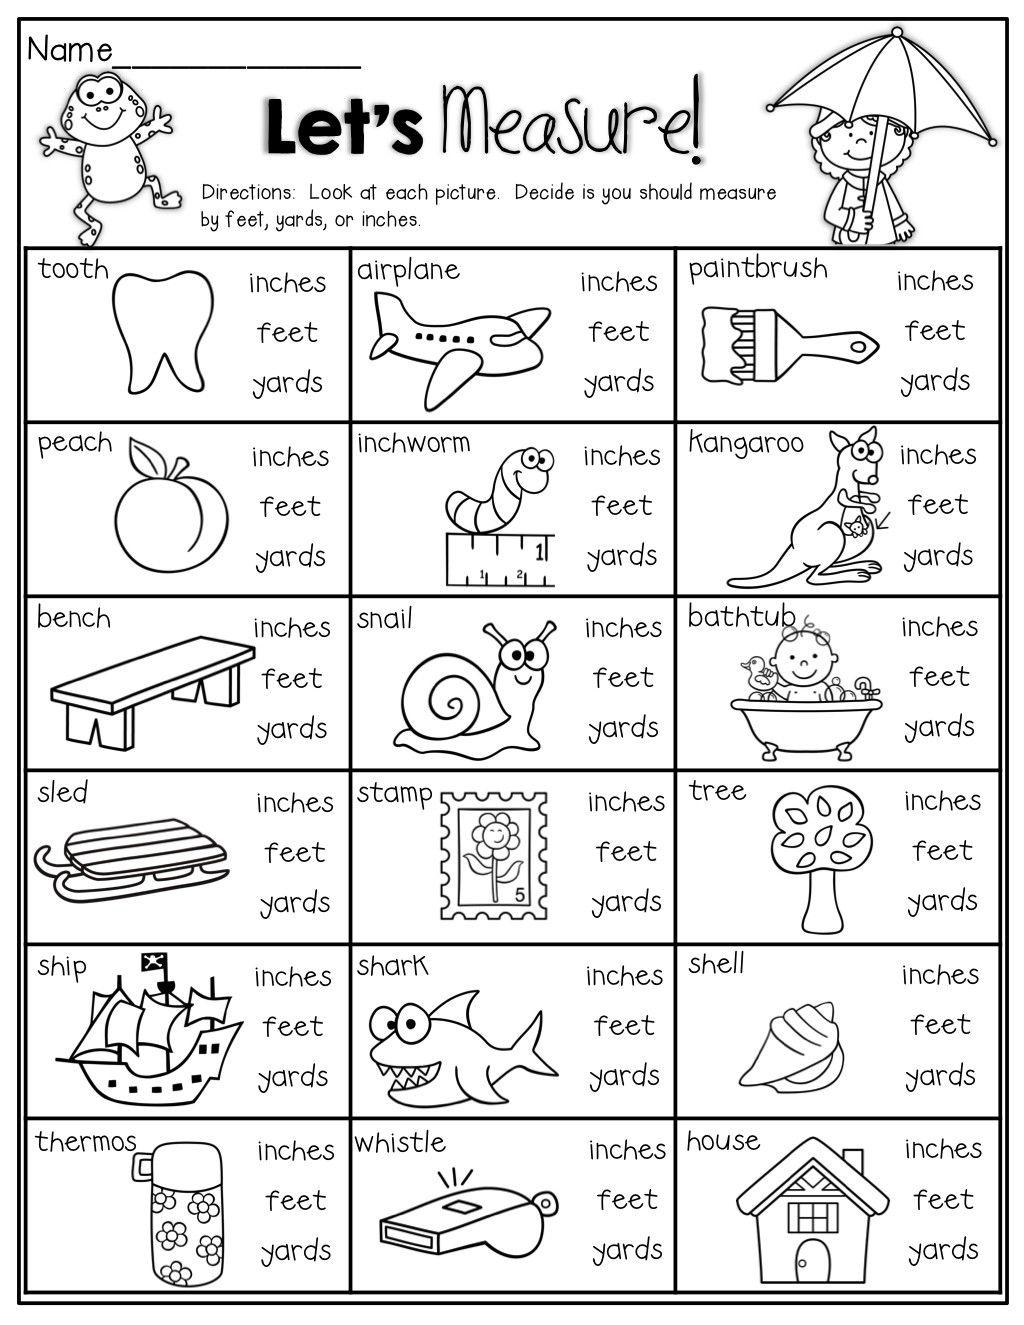 4 Worksheet Free Math Worksheets Second Grade 2 Measurement Convert Yards  Feet Inches Eas…   Measurement worksheets [ 1325 x 1024 Pixel ]